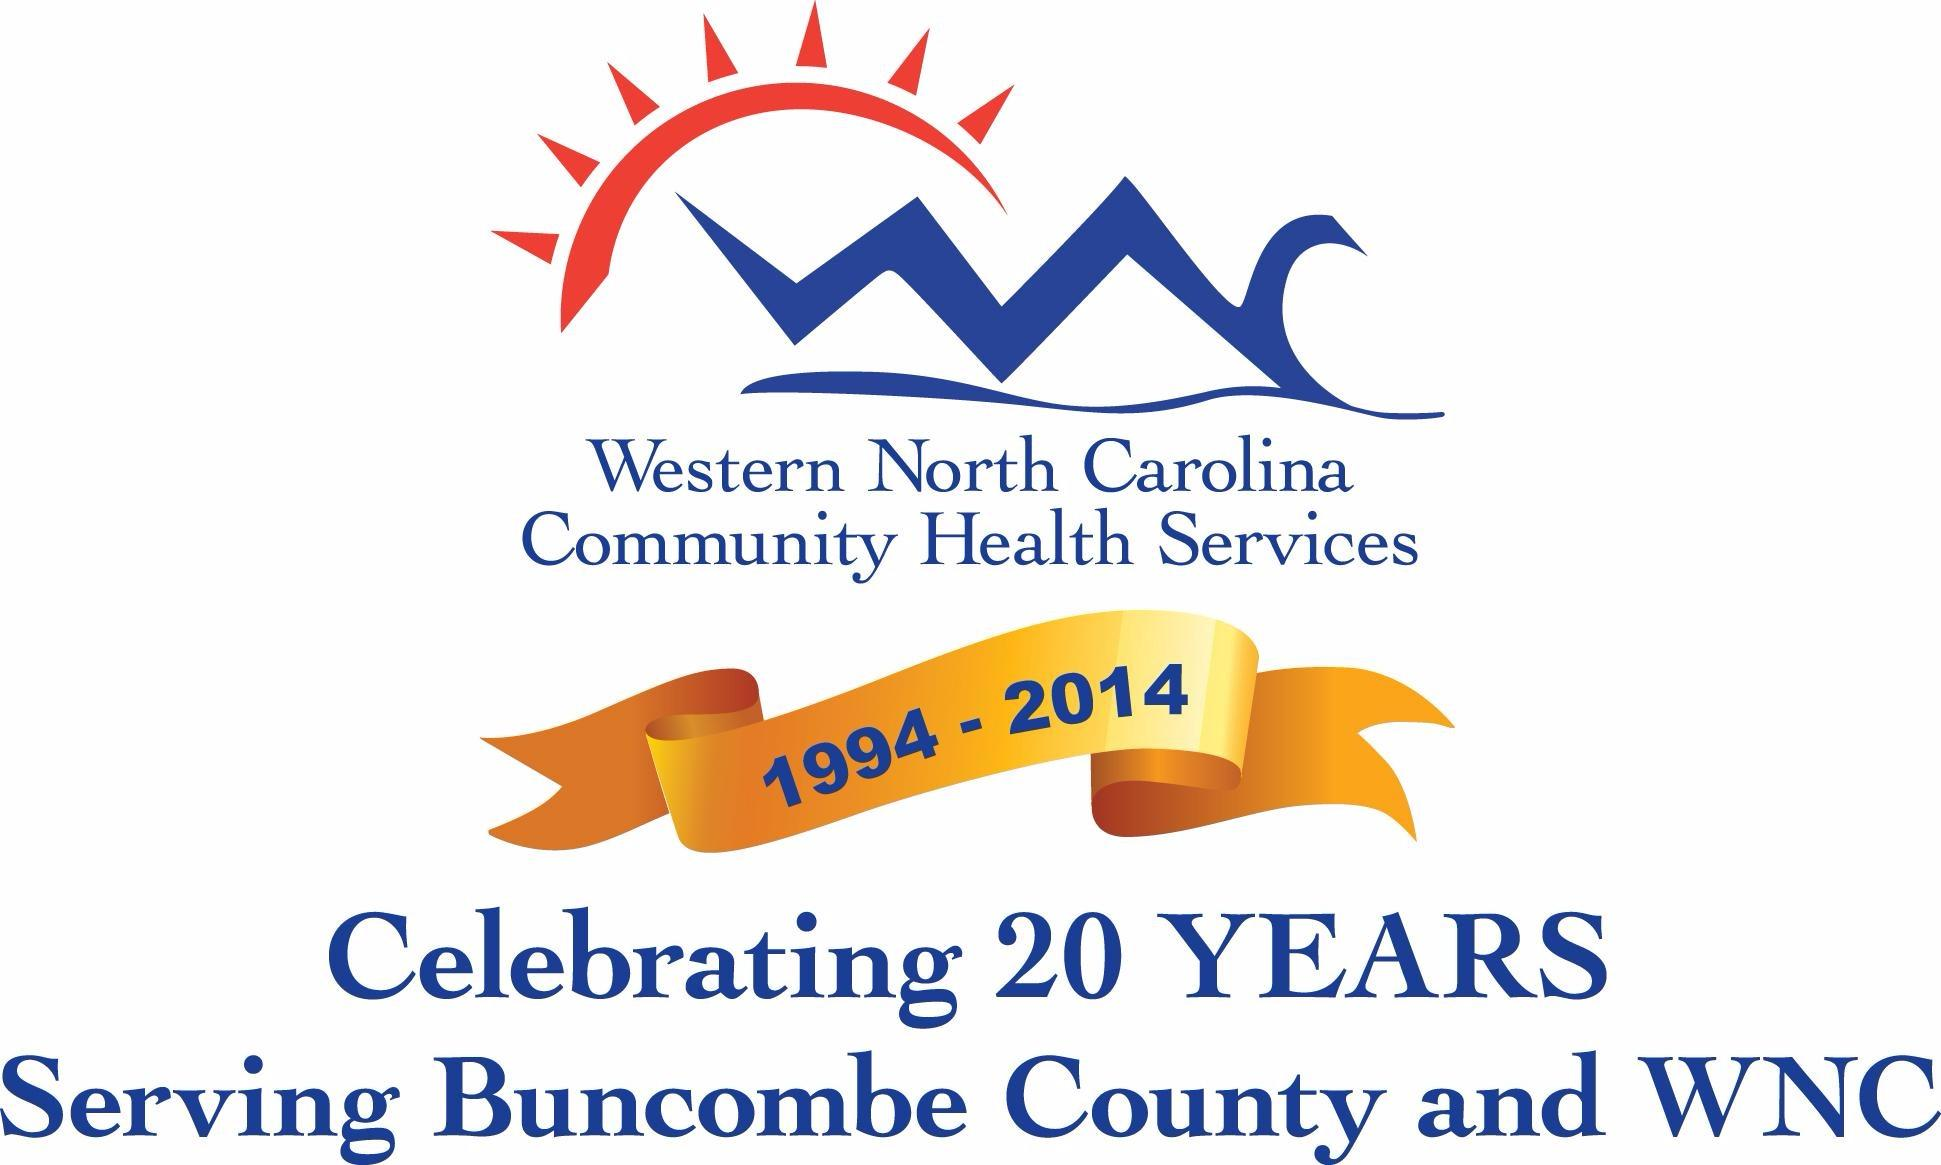 Western North Carolina Community Health Services image 4